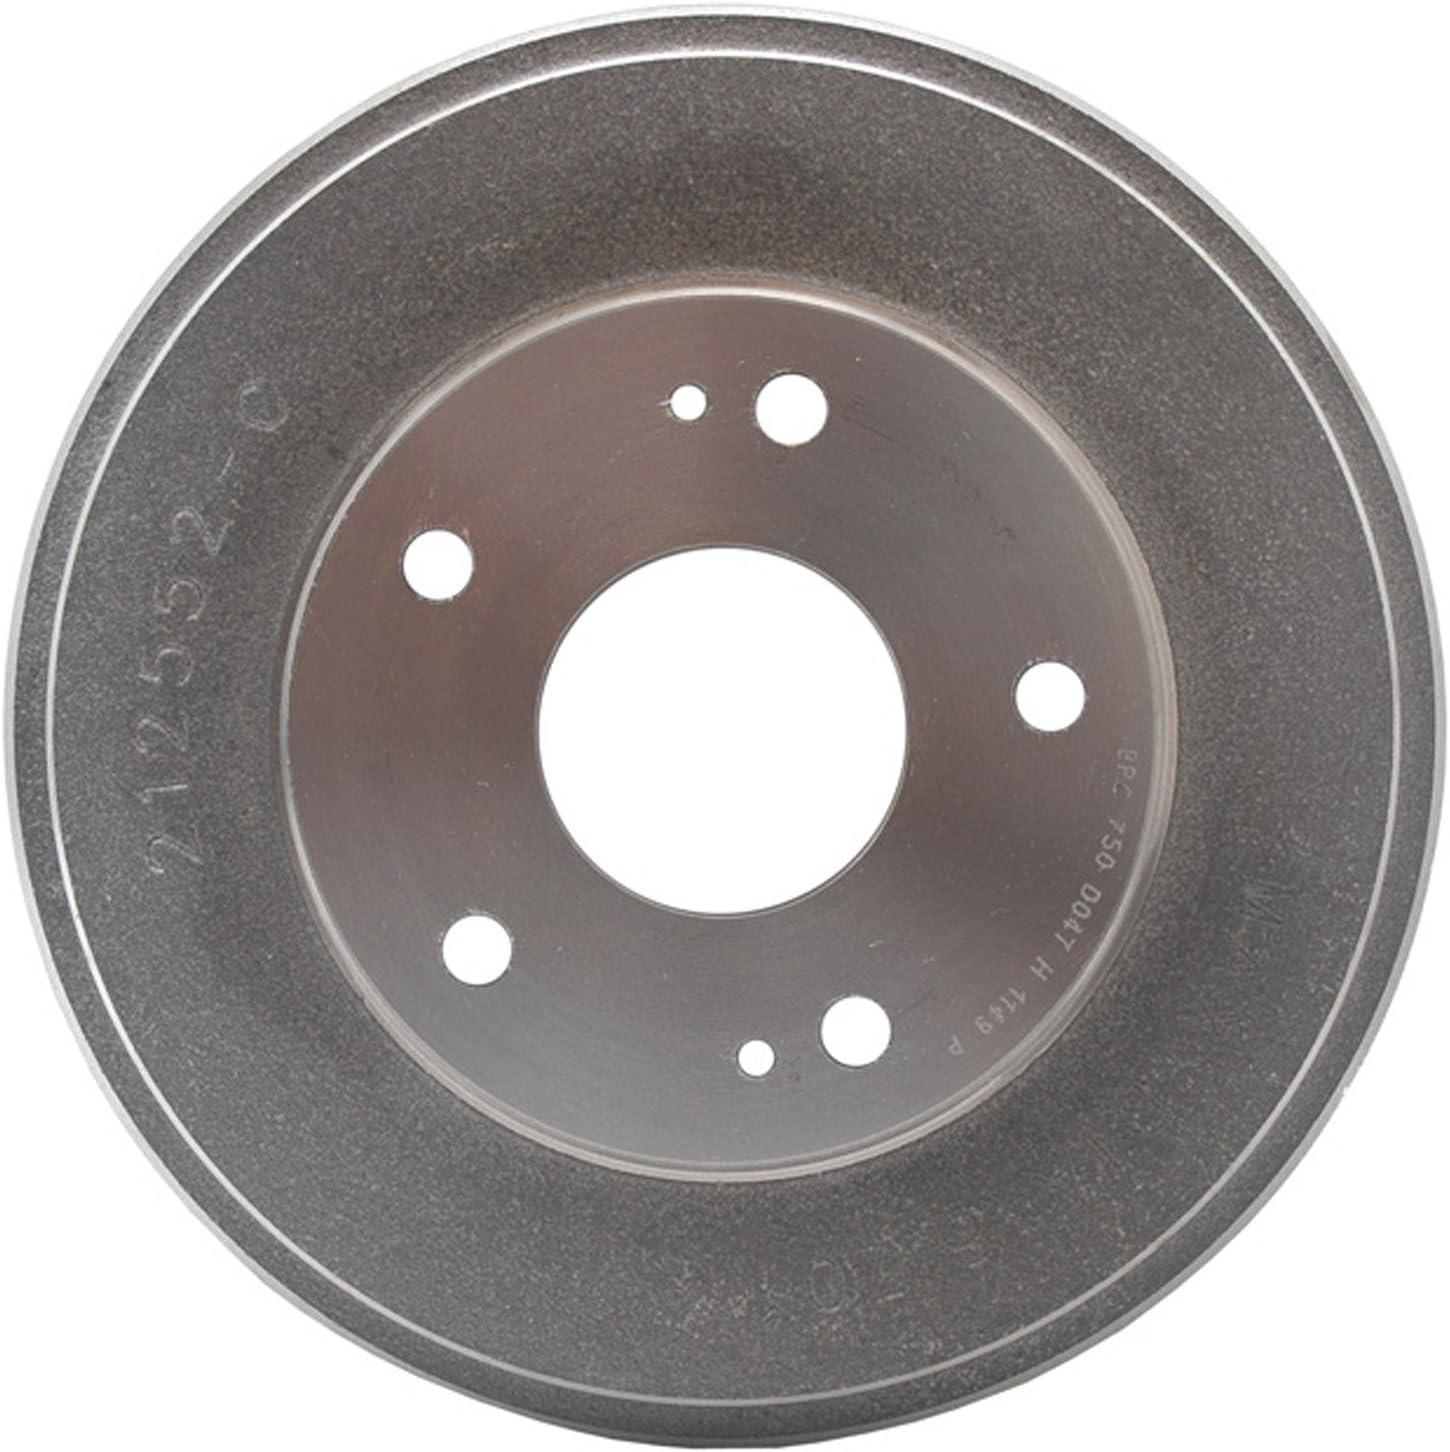 ACDelco Professional 18B450 Deluxe Rear Drum Brake Minneapolis Mall